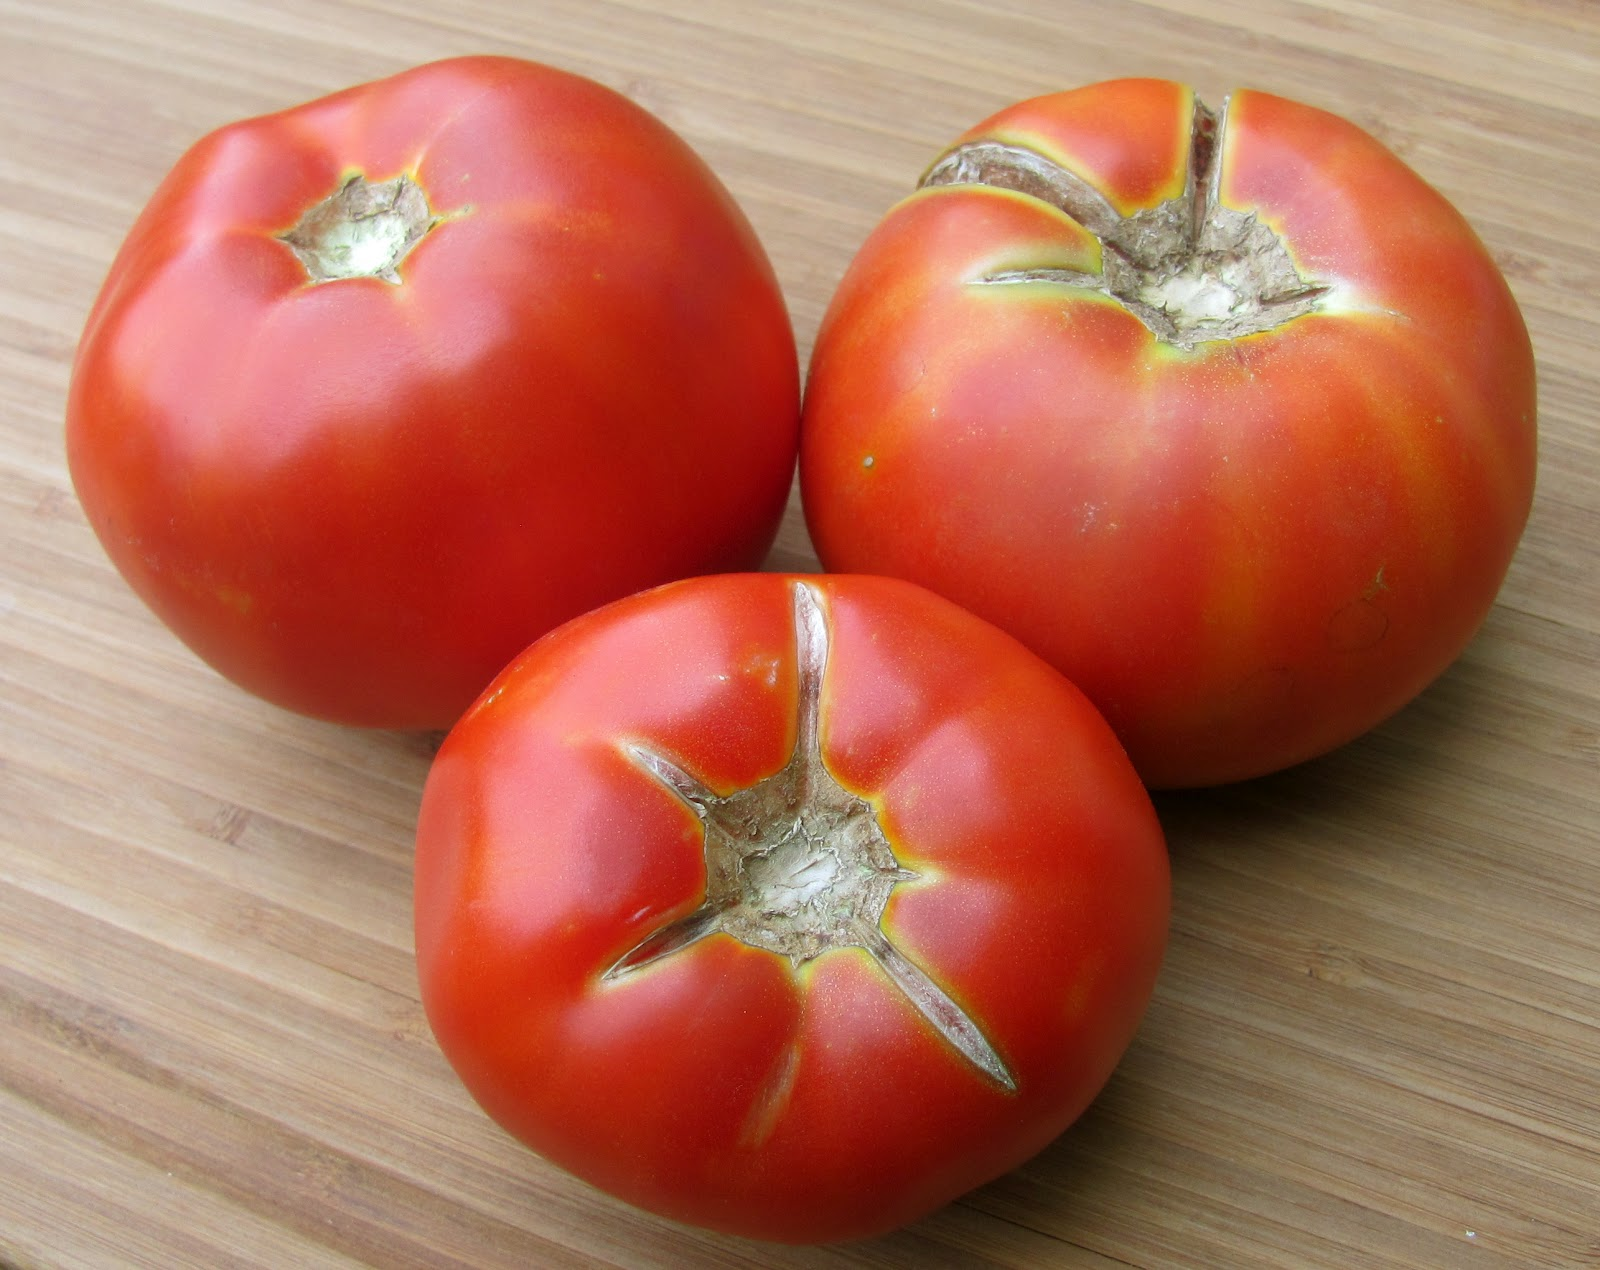 sprinkle some sunshine summertime tomato sandwich party, Natural flower